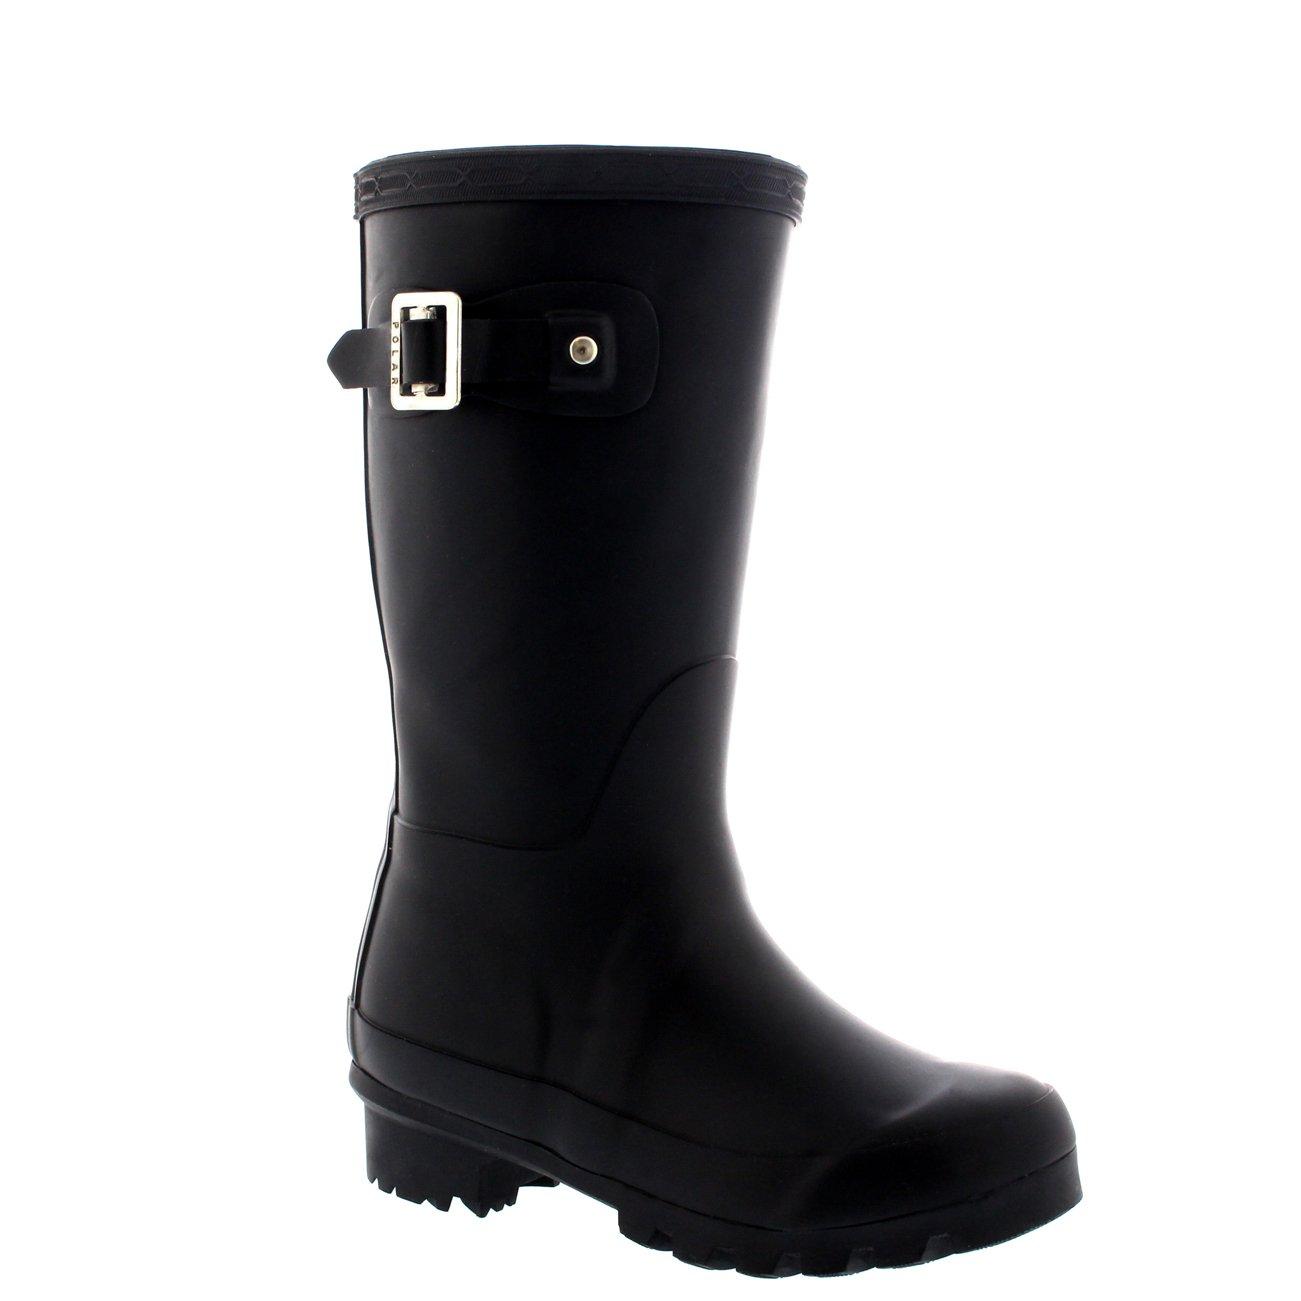 Unisex Kids Original Plain Wellie Rain Snow Winter Waterproof Mud Boots - 4 - BLA36 BL0189 by POLAR (Image #1)